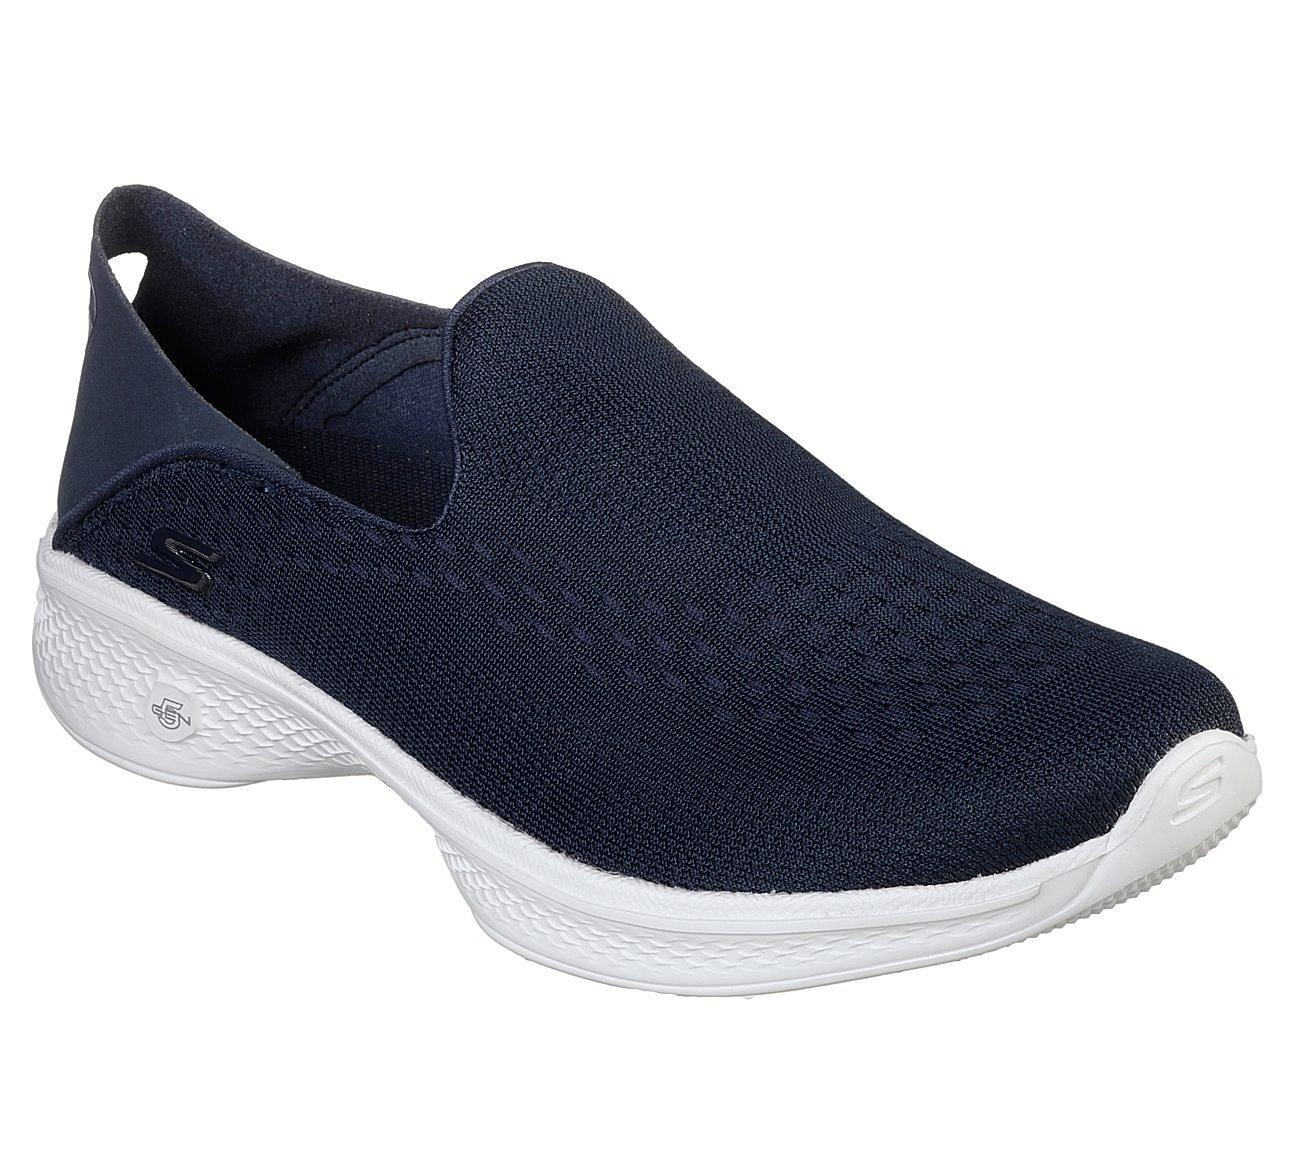 best dressy shoes for elderly women